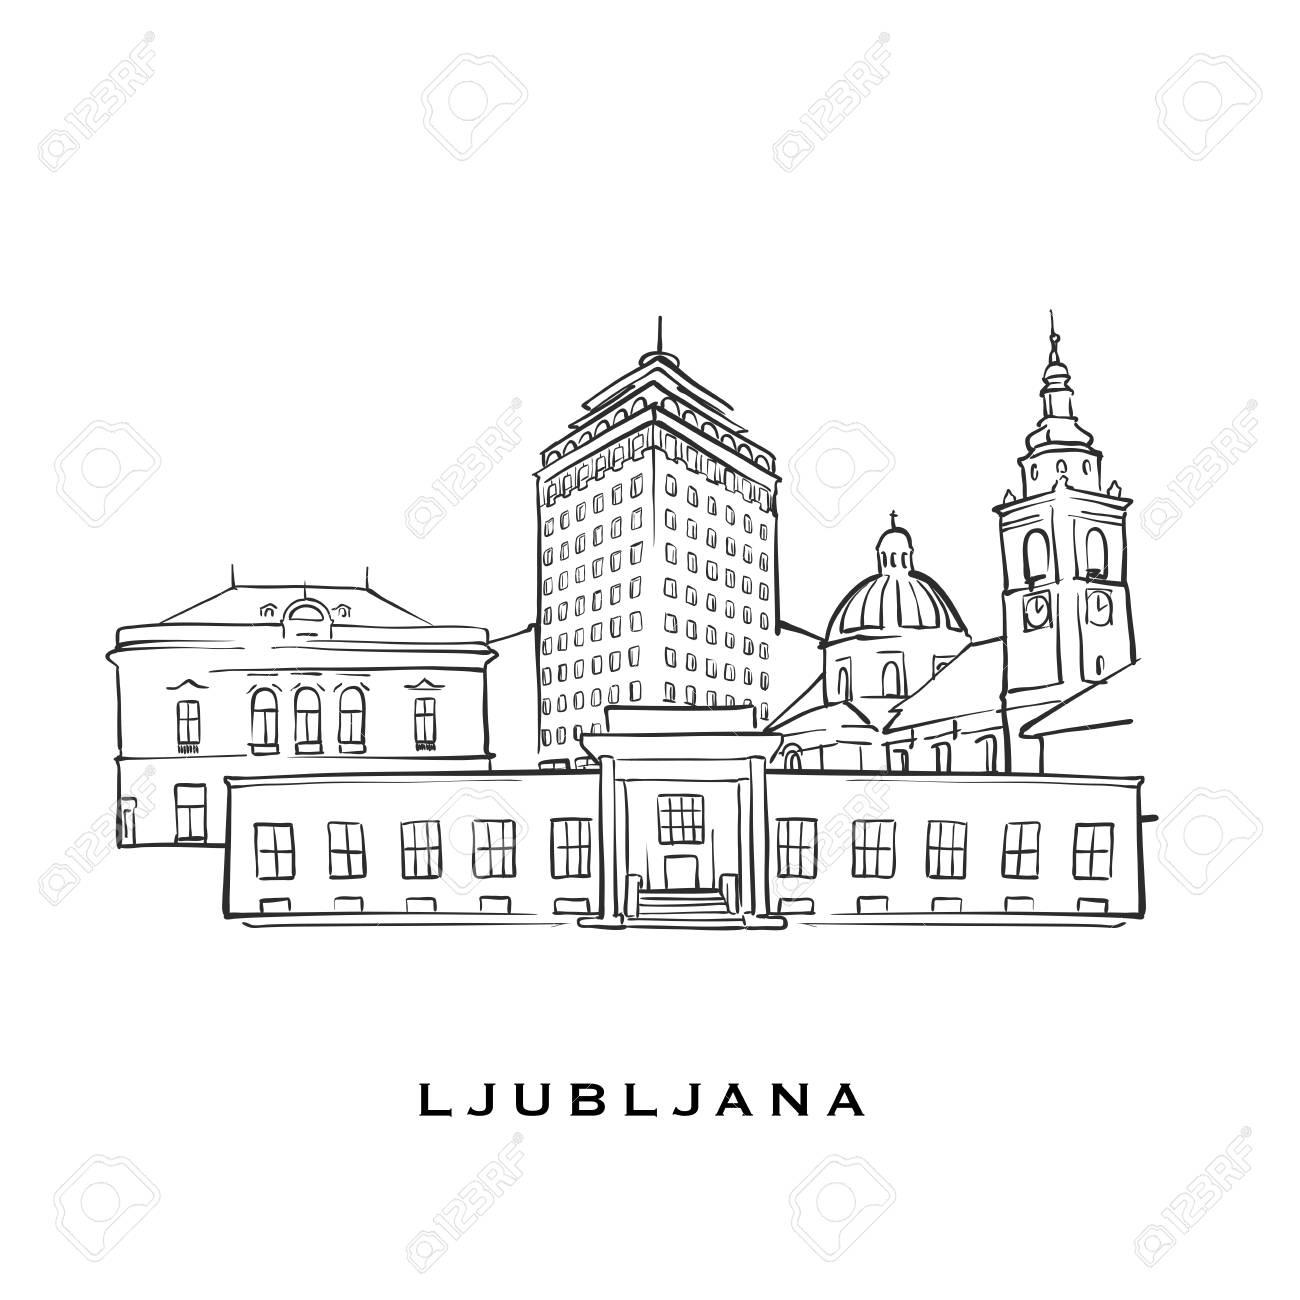 Ljubljana Slovenia famous architecture  Outlined vector sketch